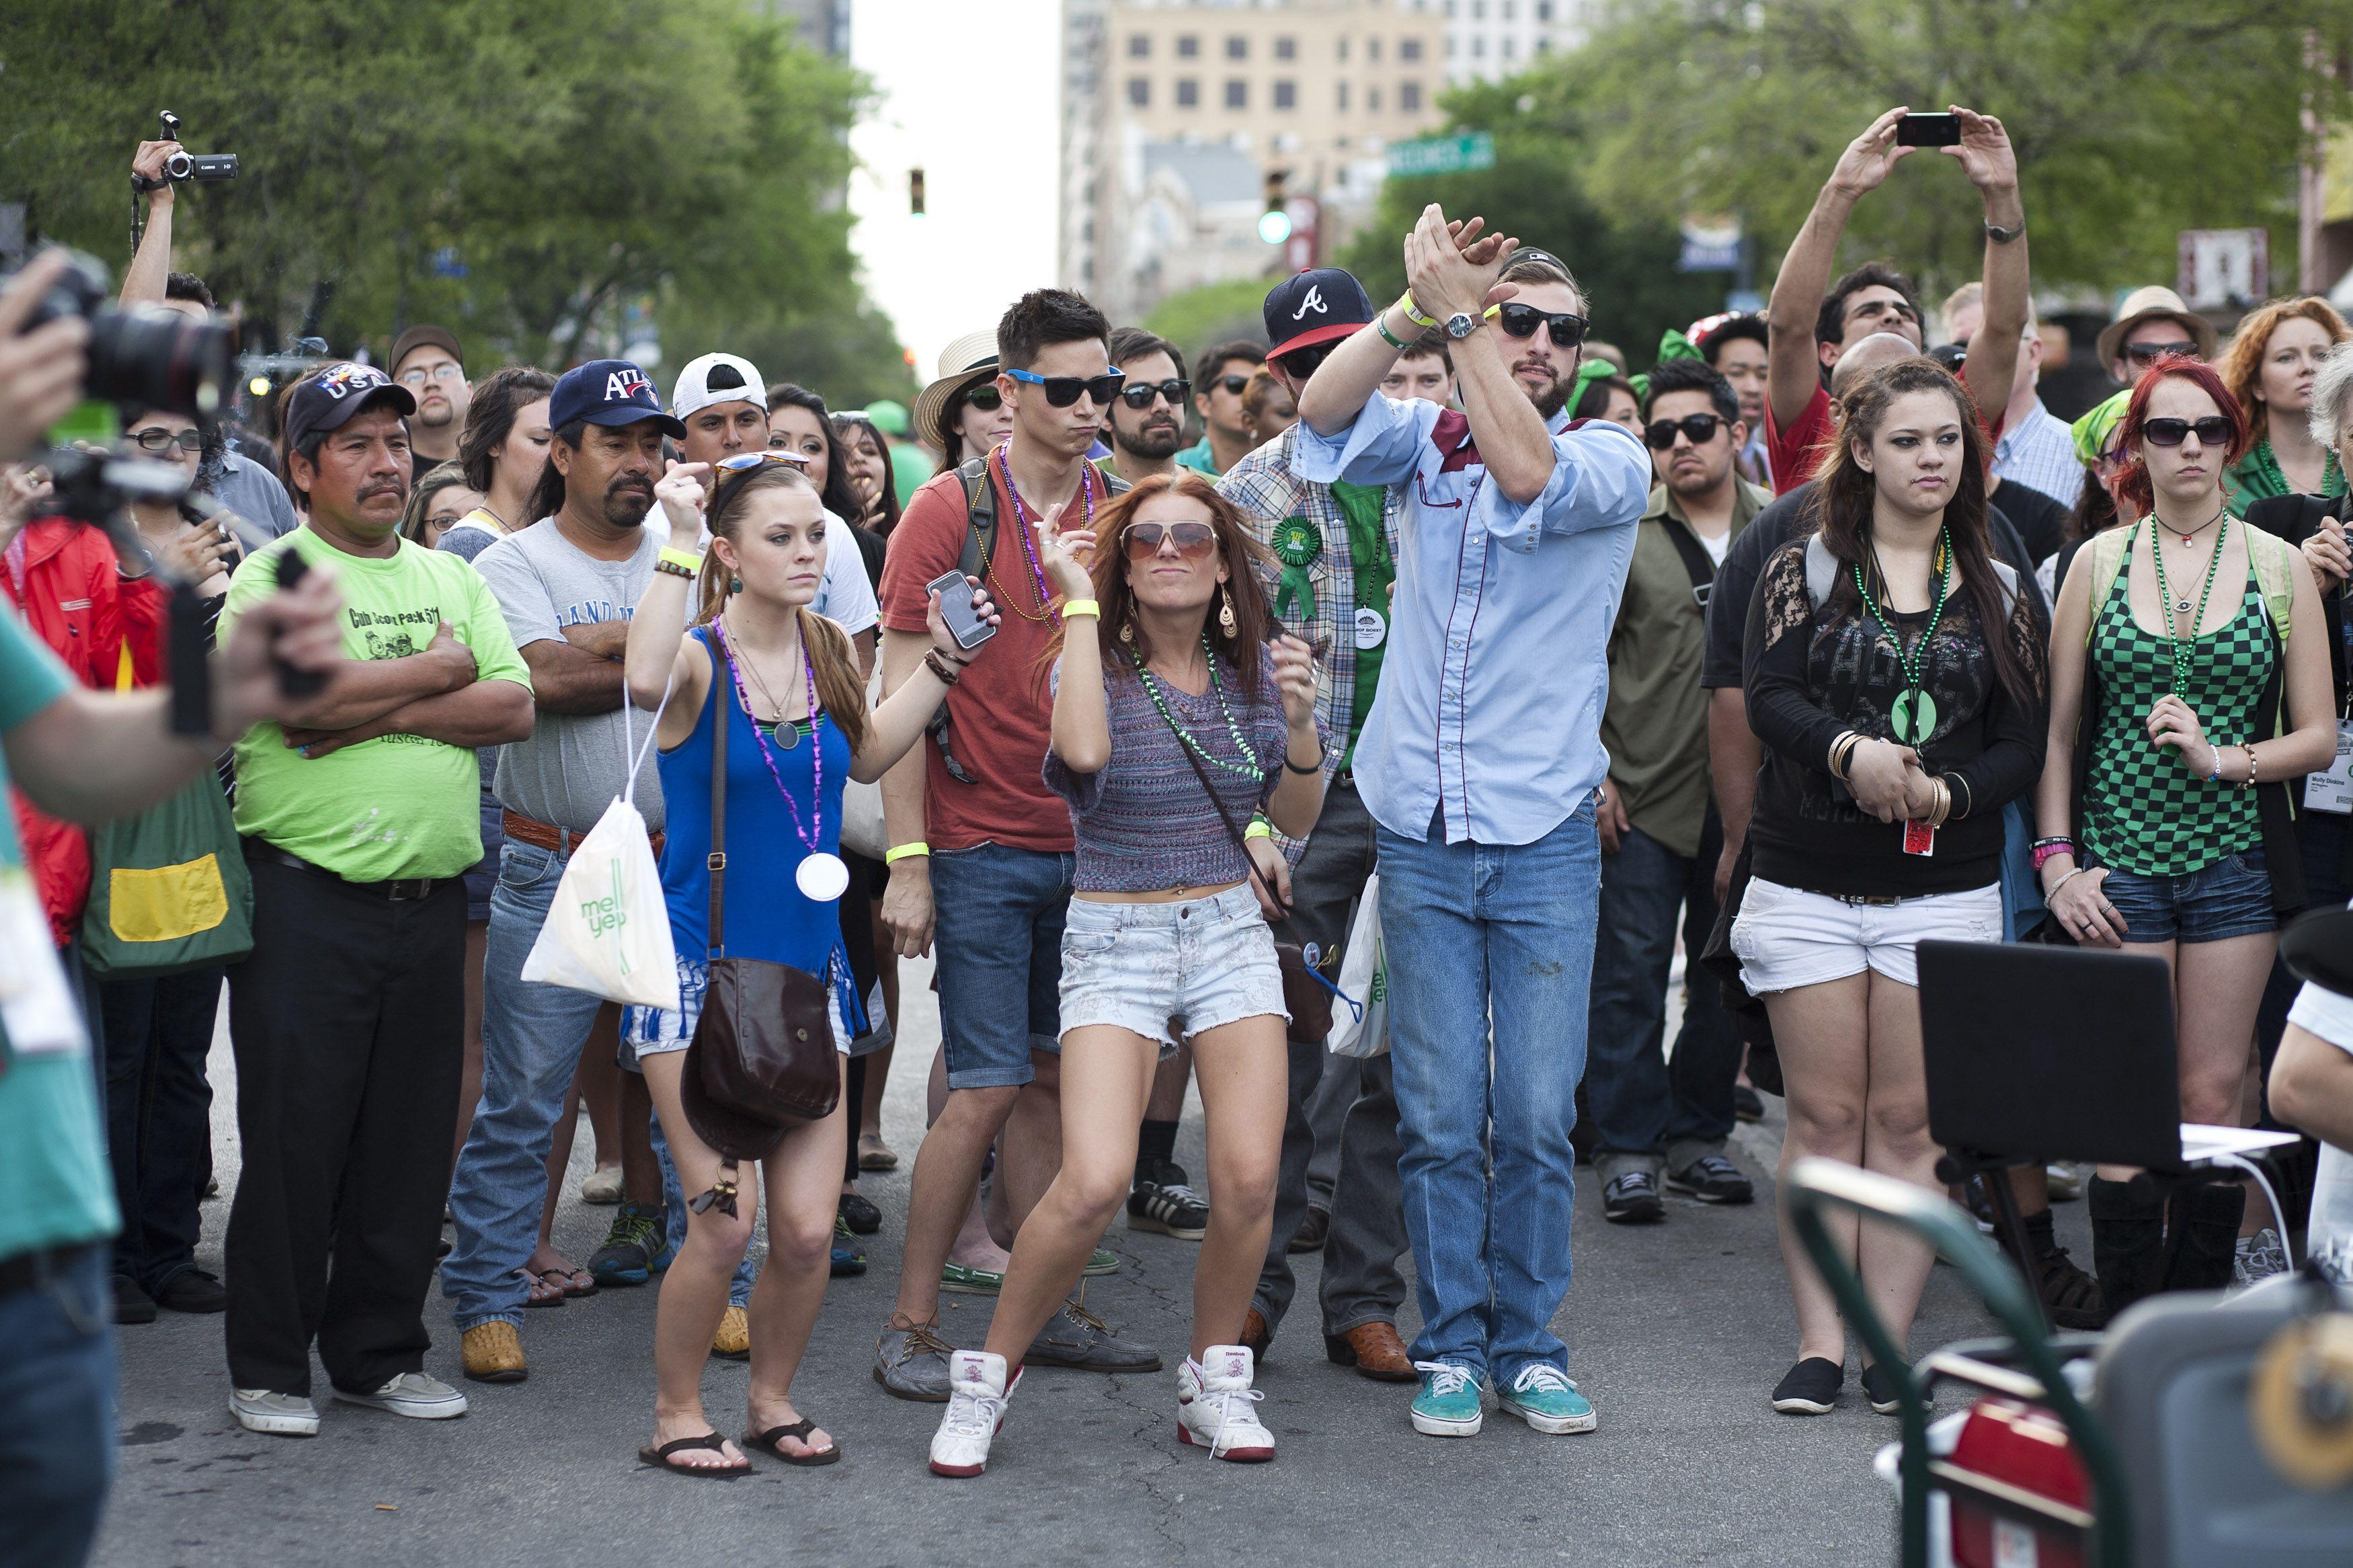 Henry SXSW millennials money